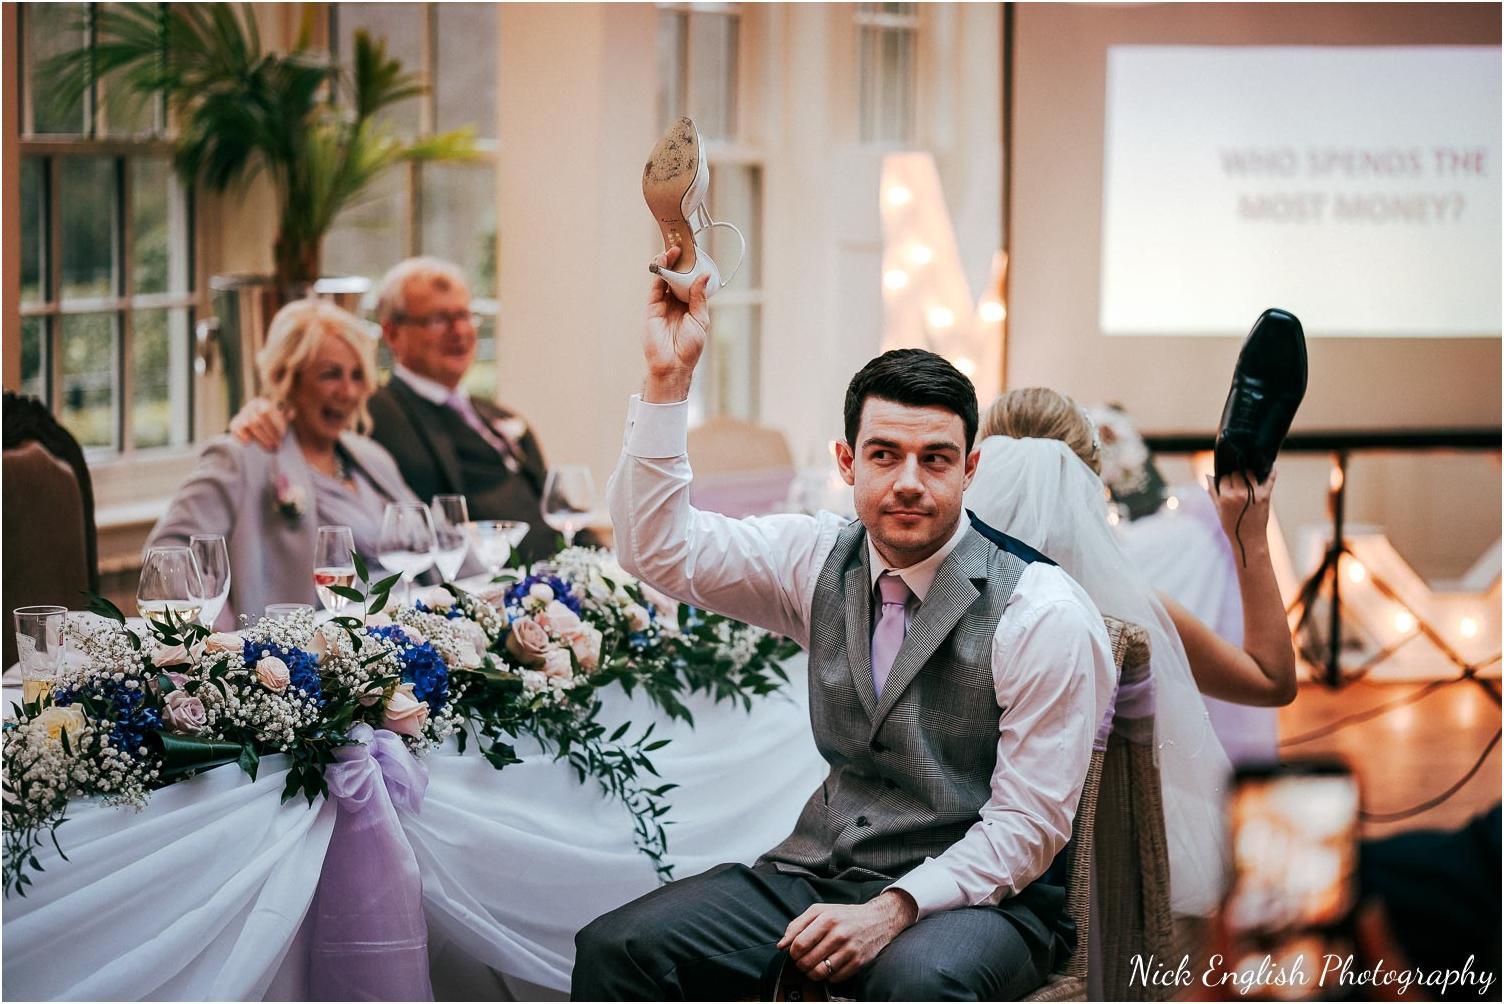 Mitton_Hall_Wedding_Photographer_2018-129.jpg